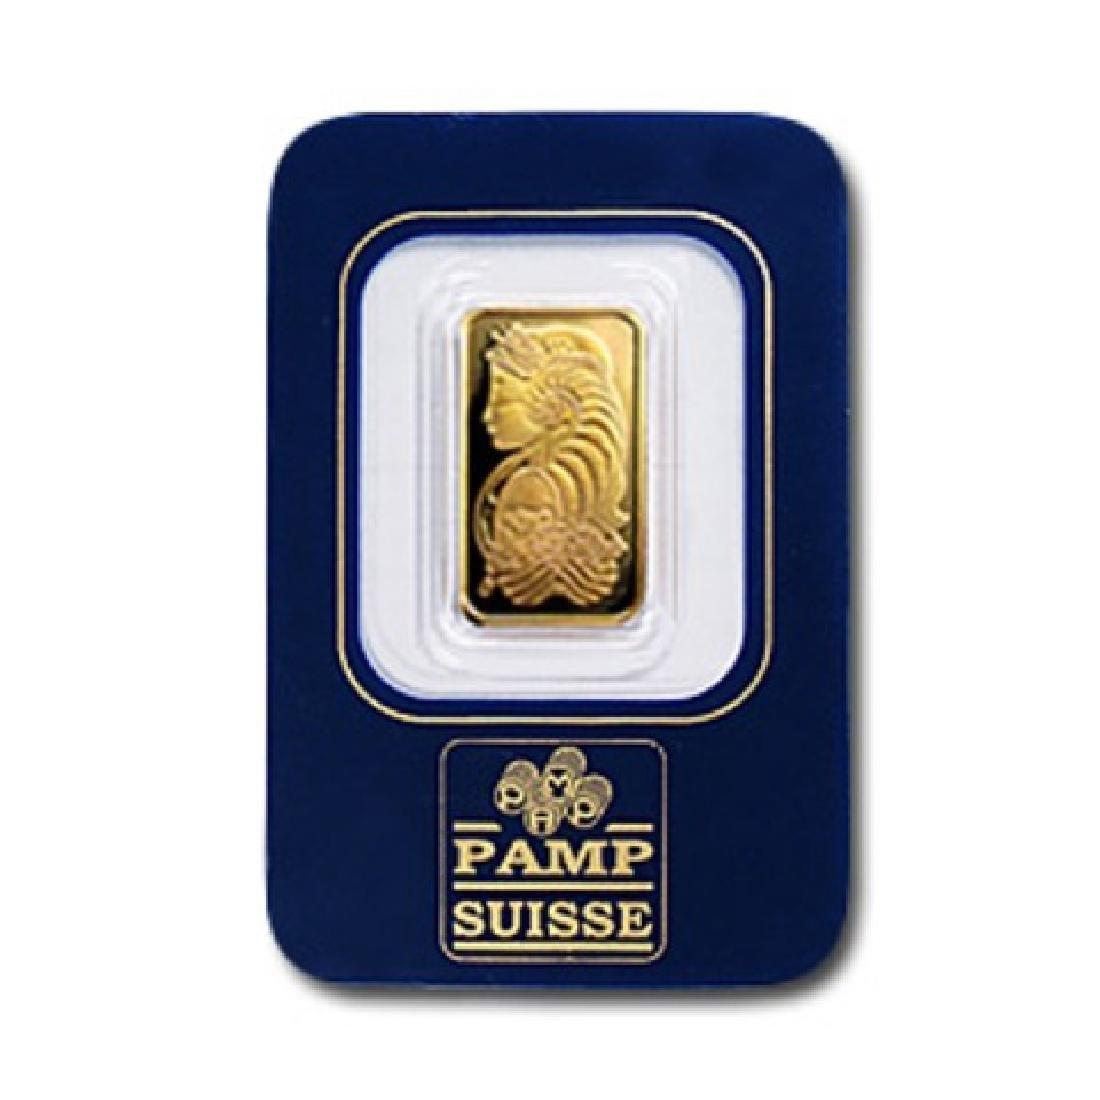 2.5 Gram Pamp Suisse Gold Ingot on Assay Card